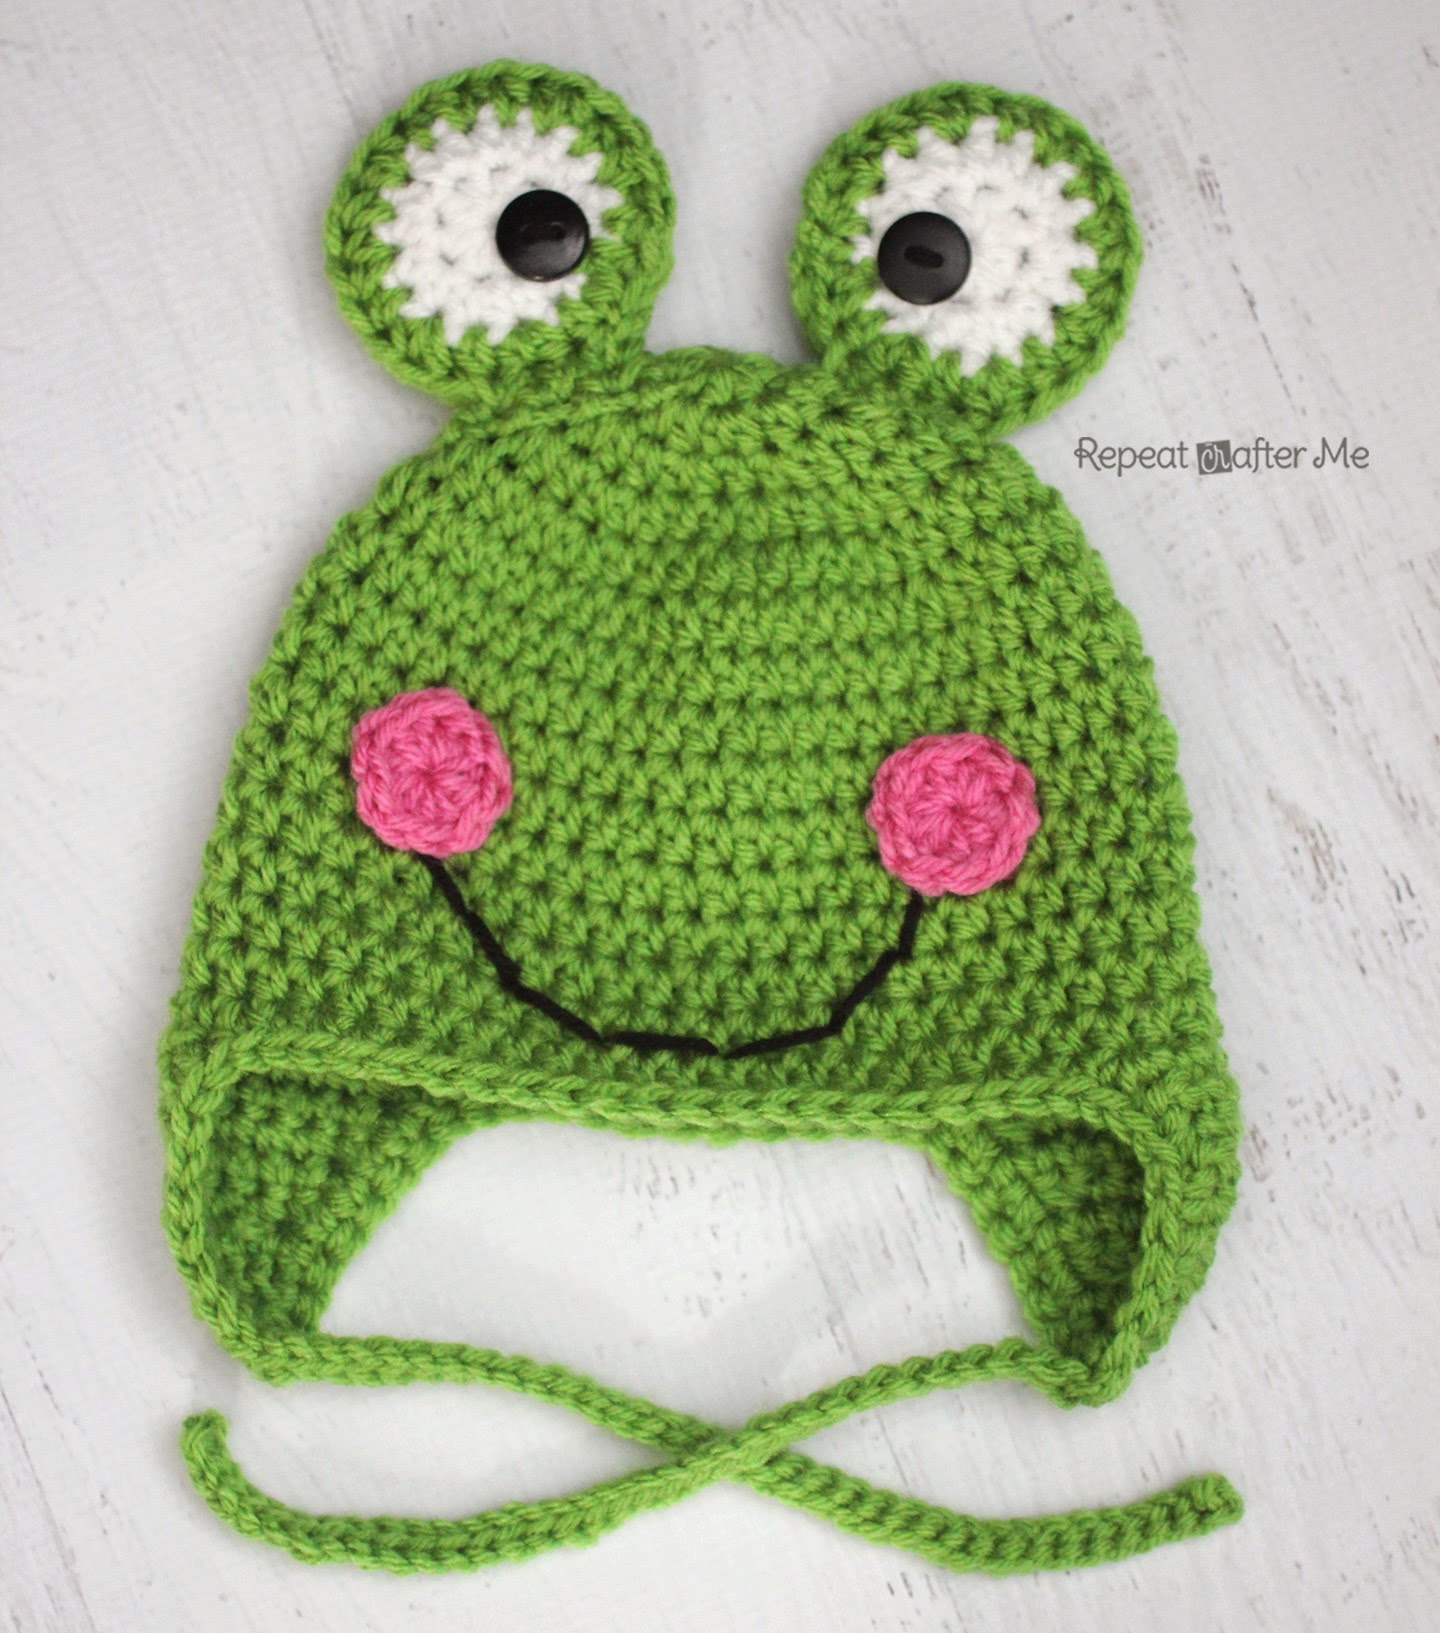 Free Crochet Pattern Newborn Frog Hat : Repeat Crafter Me: Crochet Frog Hat Pattern